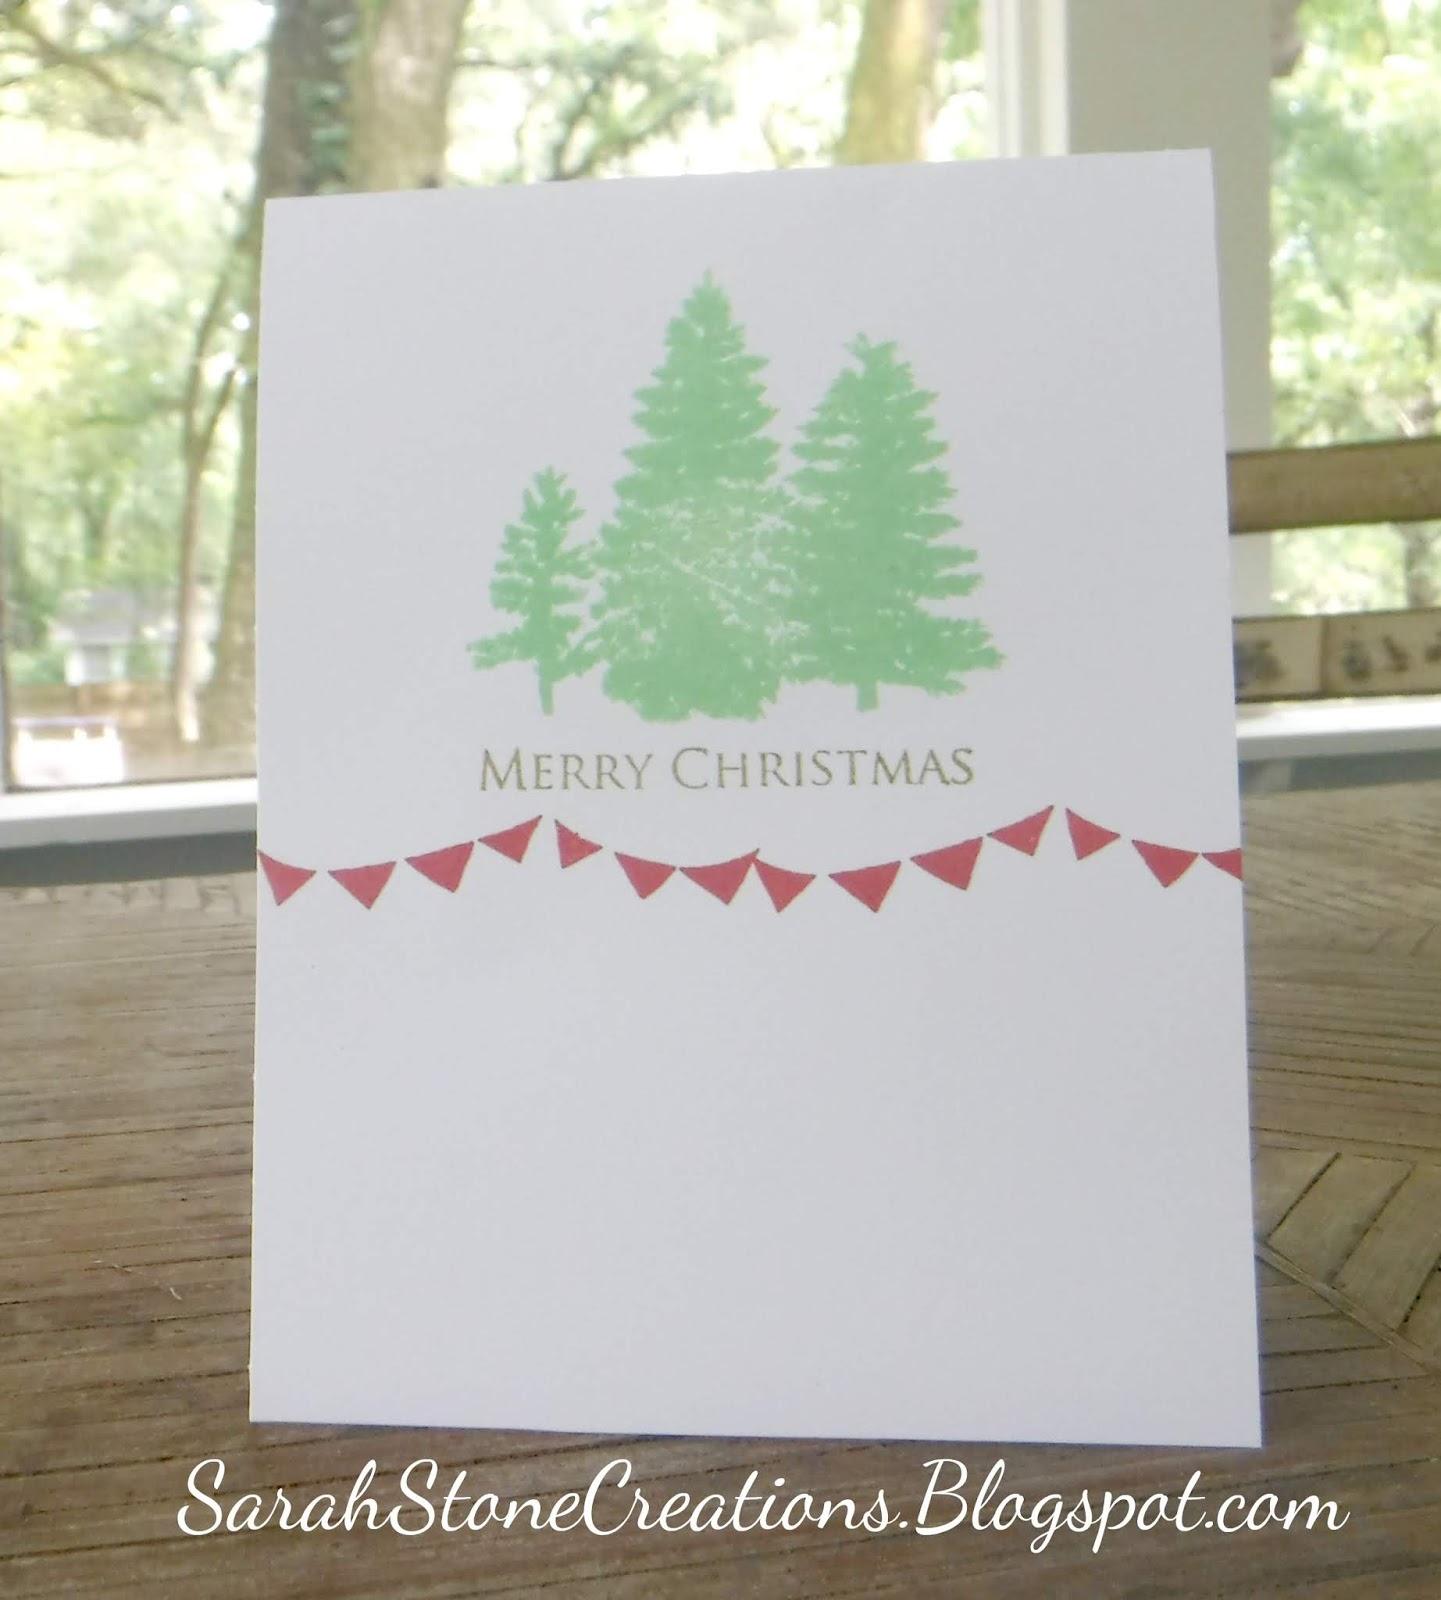 Sarah Stone Creations: Pistachio Christmas Trees